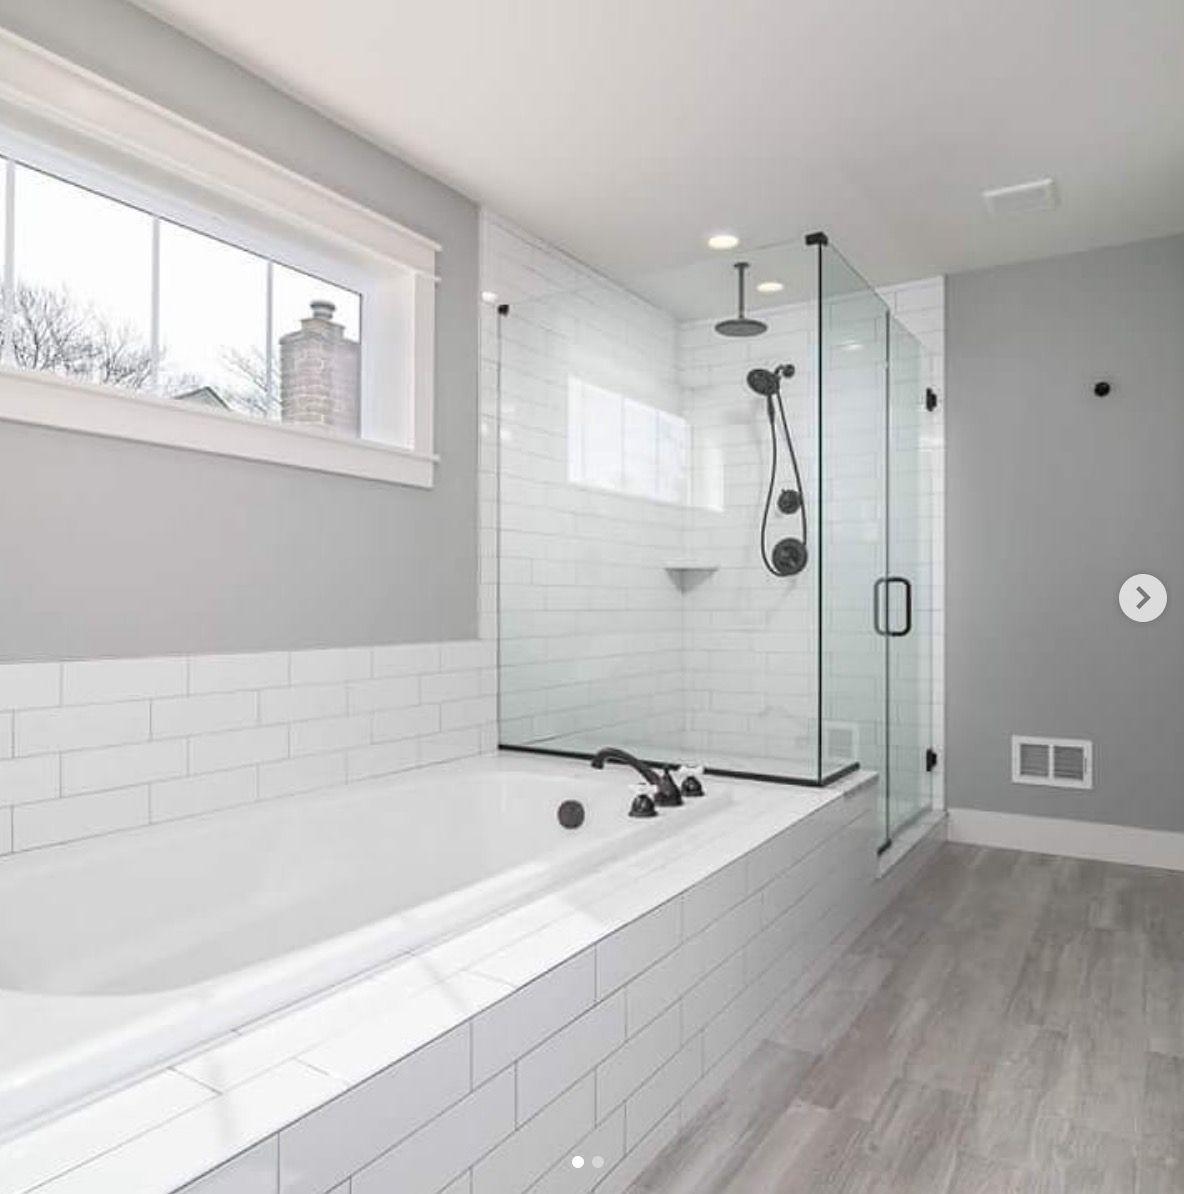 Modern Farmhouse Bathroom Subway Tile White Subway Tile Oil Rubbed Bronze Farmhouse Faux Woo Modern Farmhouse Bathroom Master Bath Shower Faux Wood Tiles